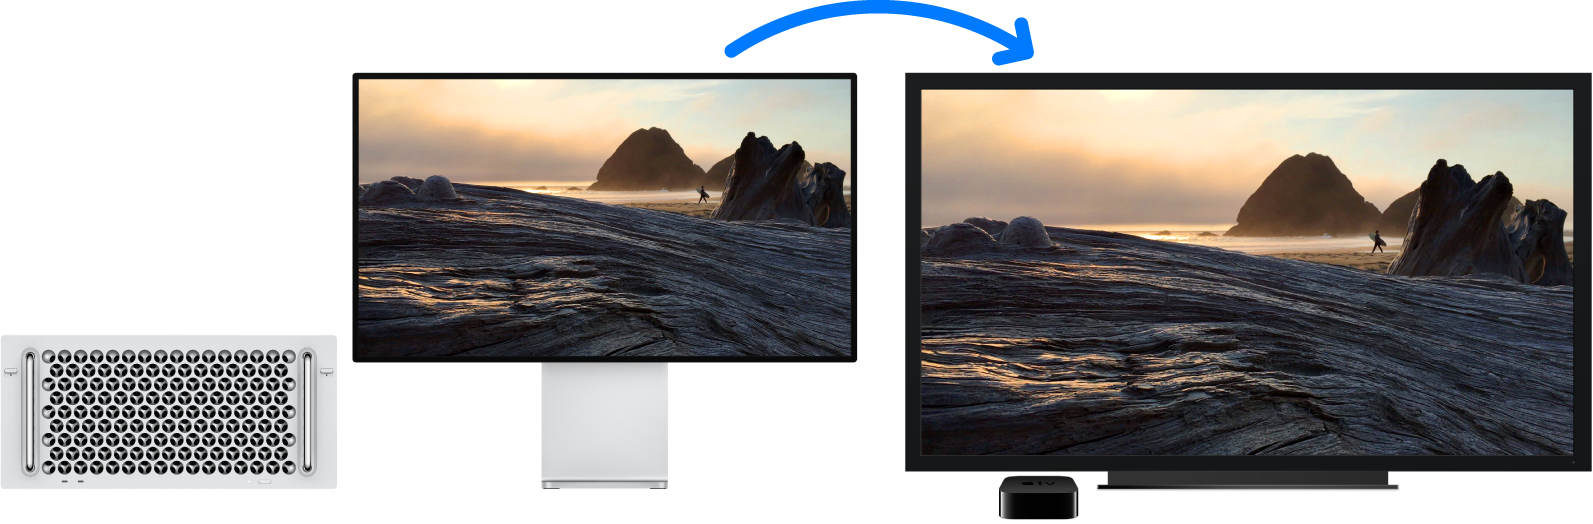 MacPro שהתוכן שלו משוקף על מסך HDTV גדול באמצעות AppleTV.